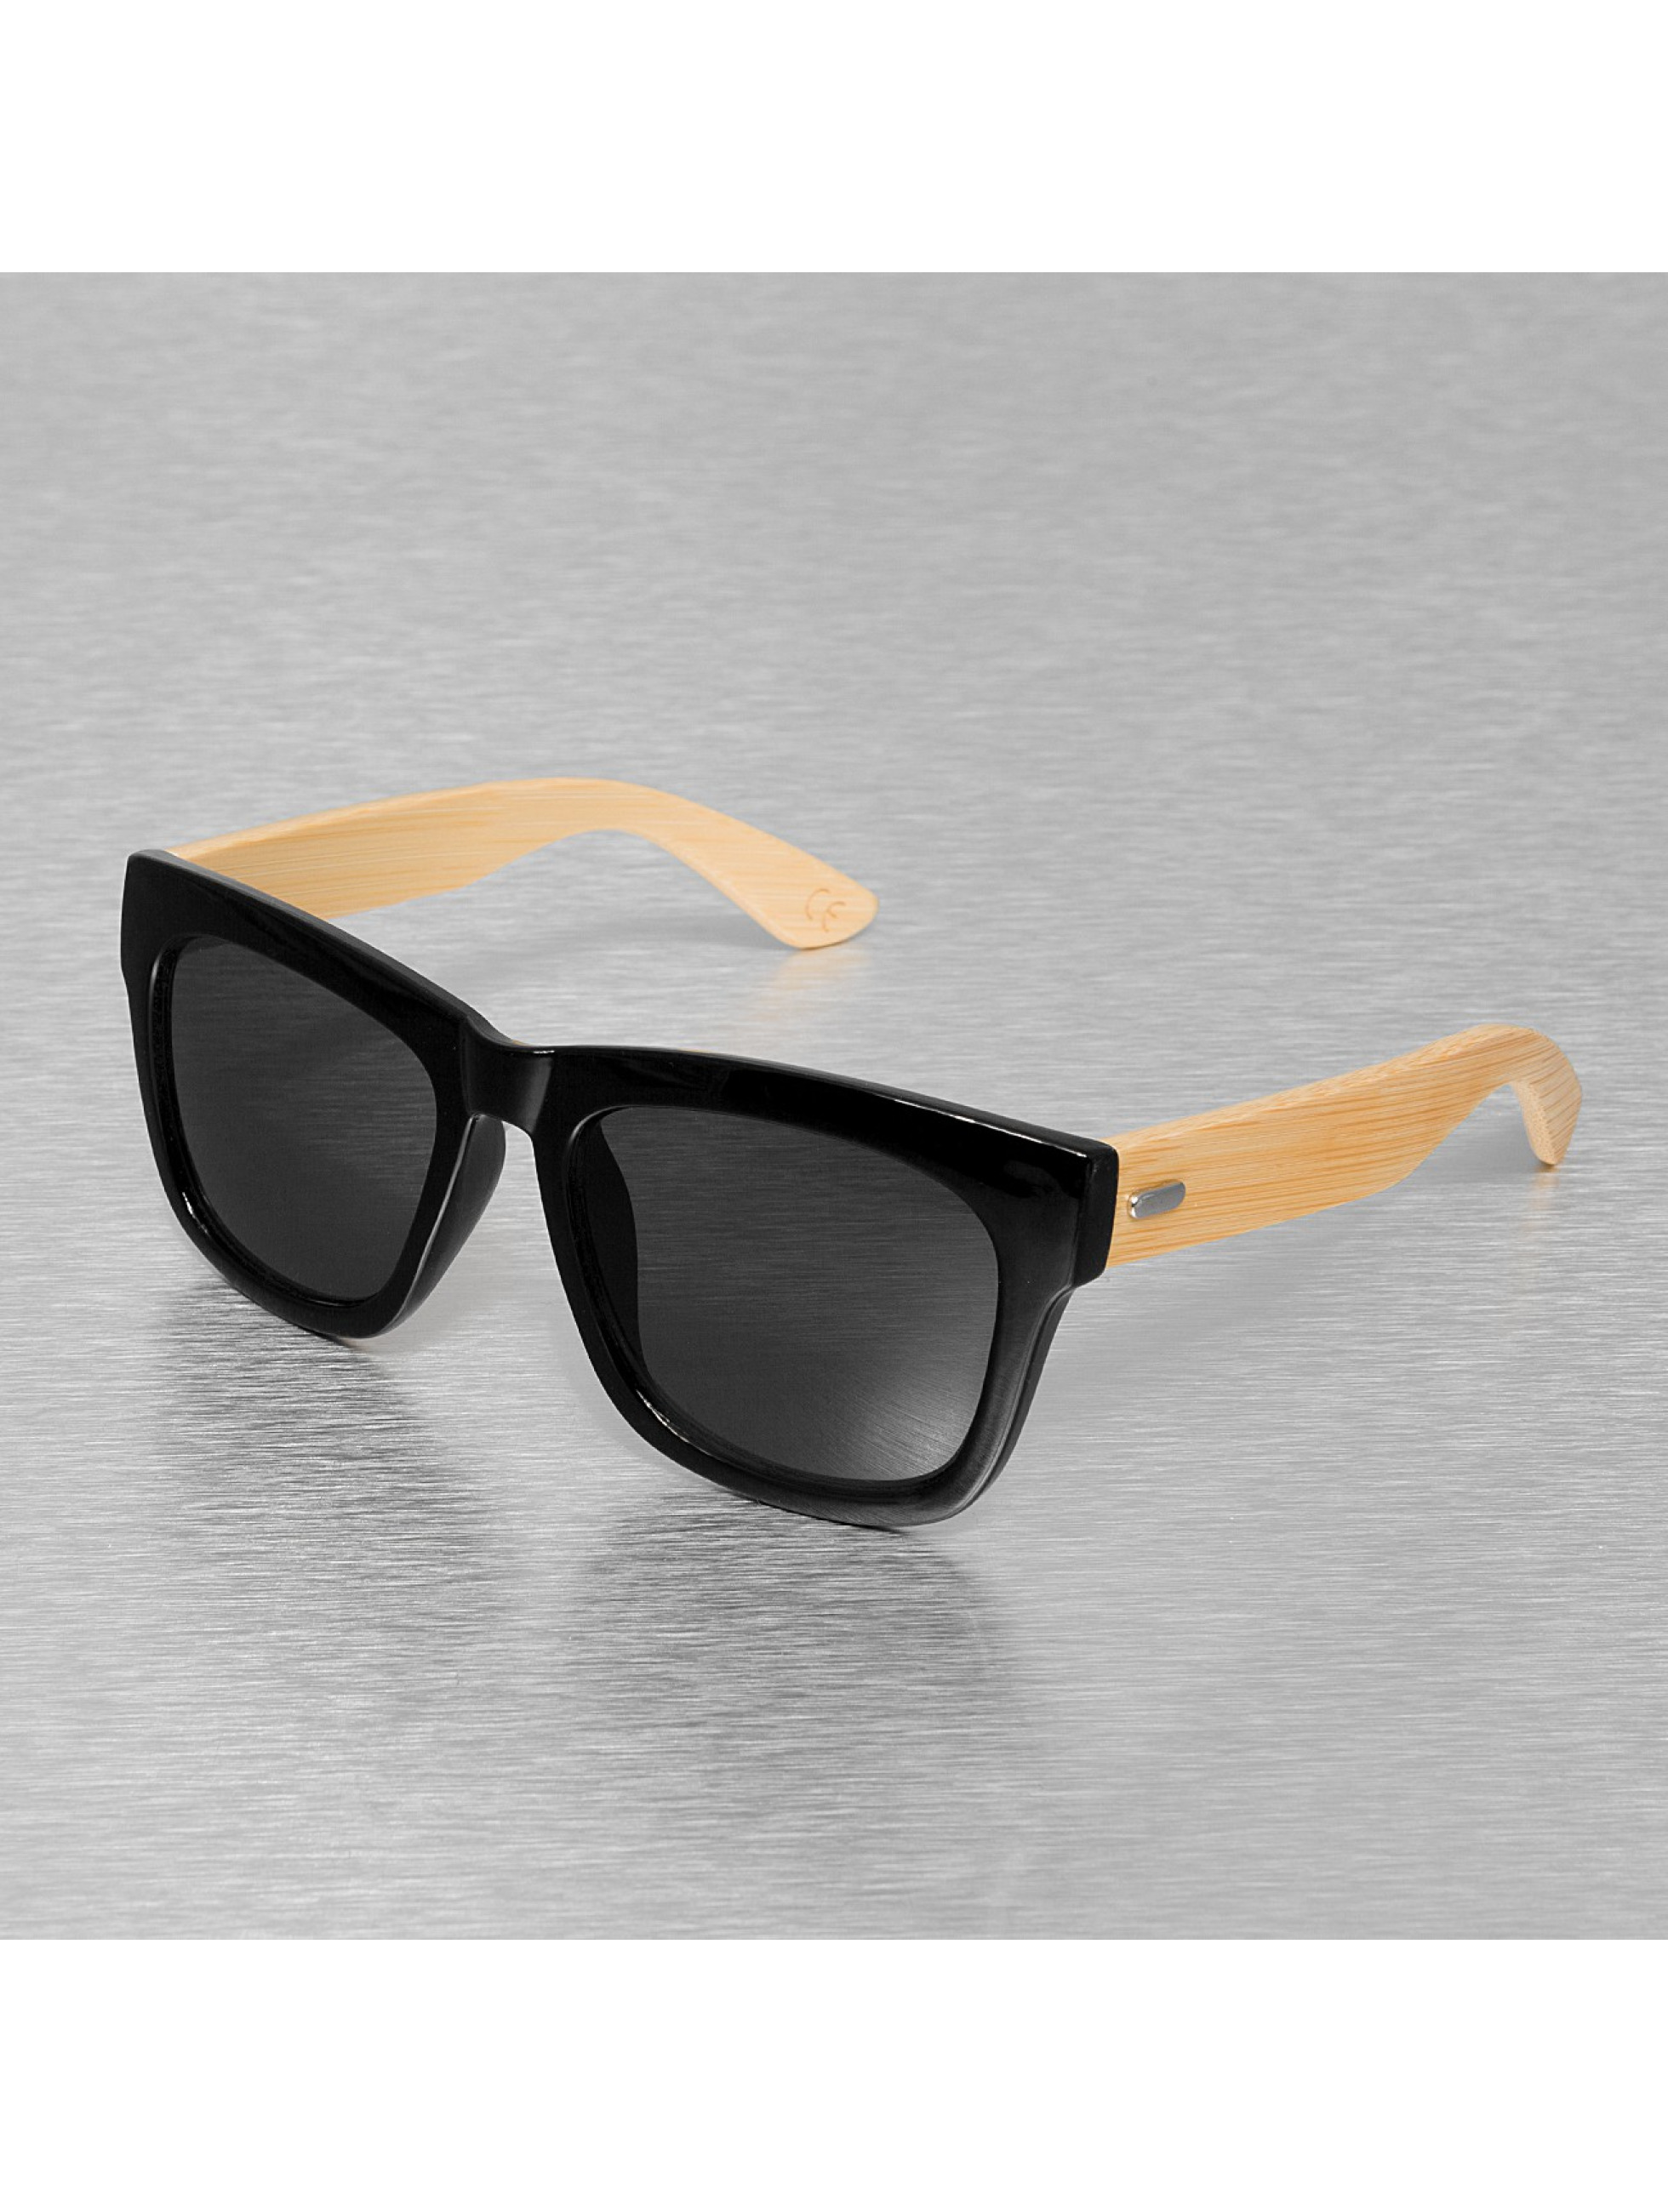 Miami Vision Zonnebril Bamboo zwart